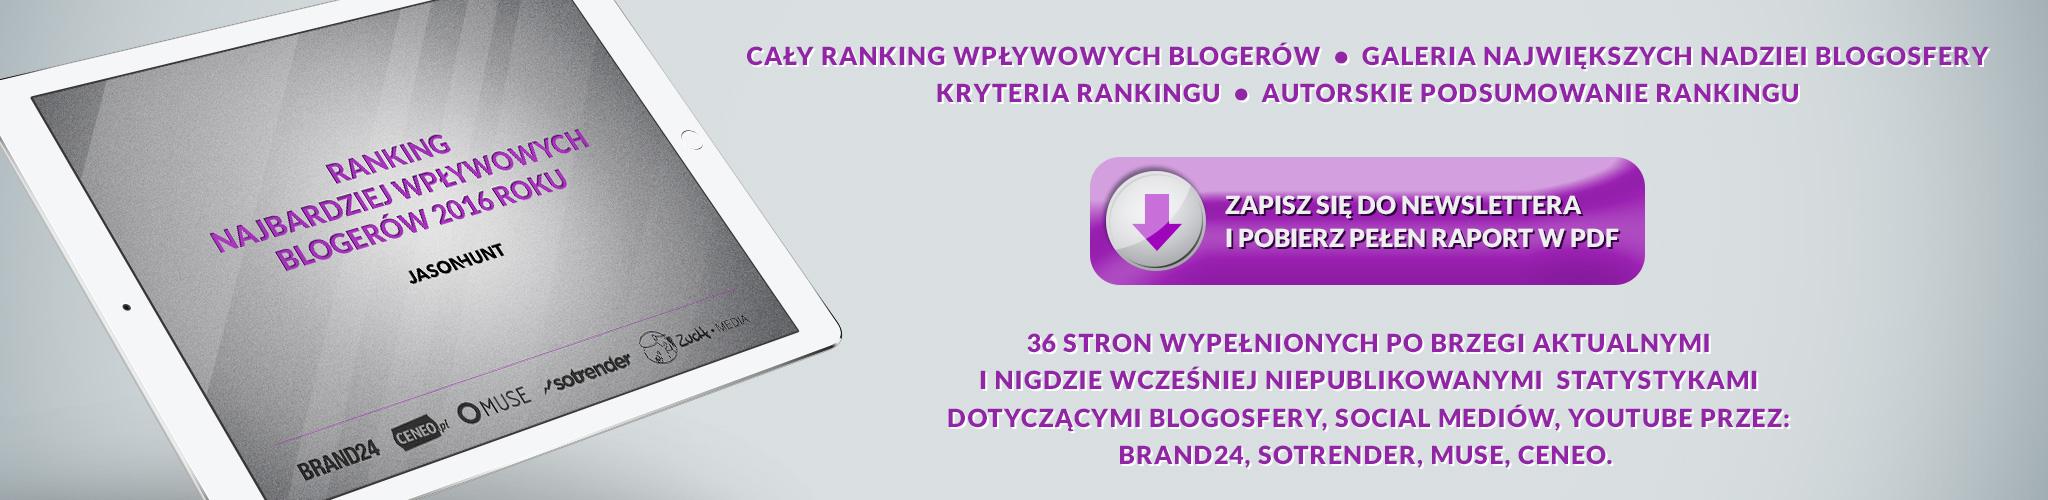 jh_ranking_banner